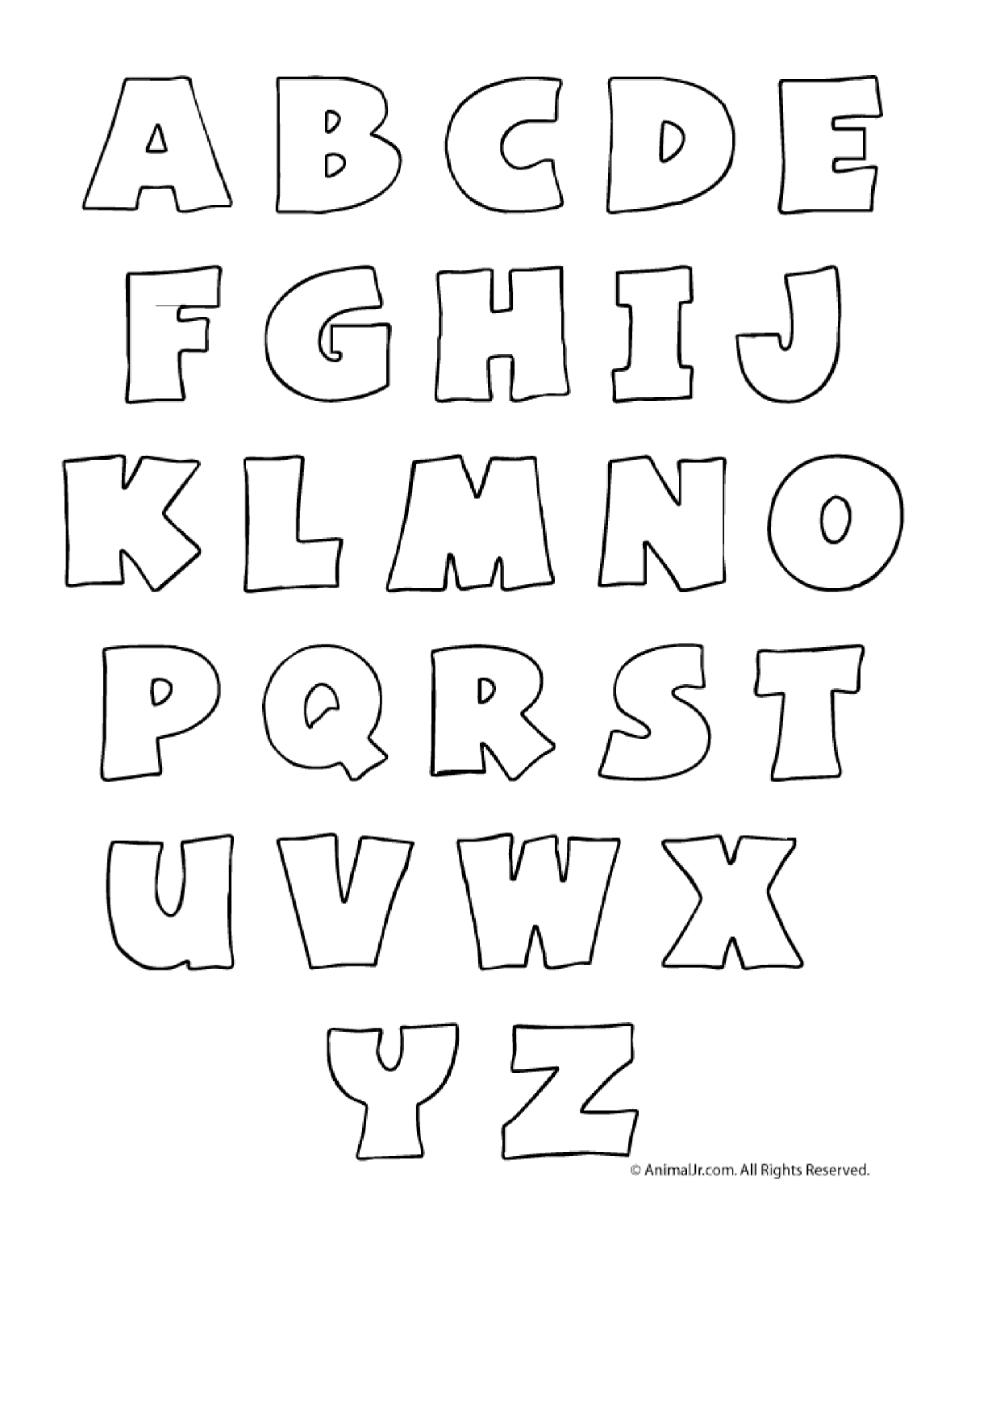 Printable Alphabet Bubble Letters Templates At Allbusinesstemplates Com Bubble Letters Alphabet Lettering Alphabet Bubble Letters [ 1415 x 1000 Pixel ]